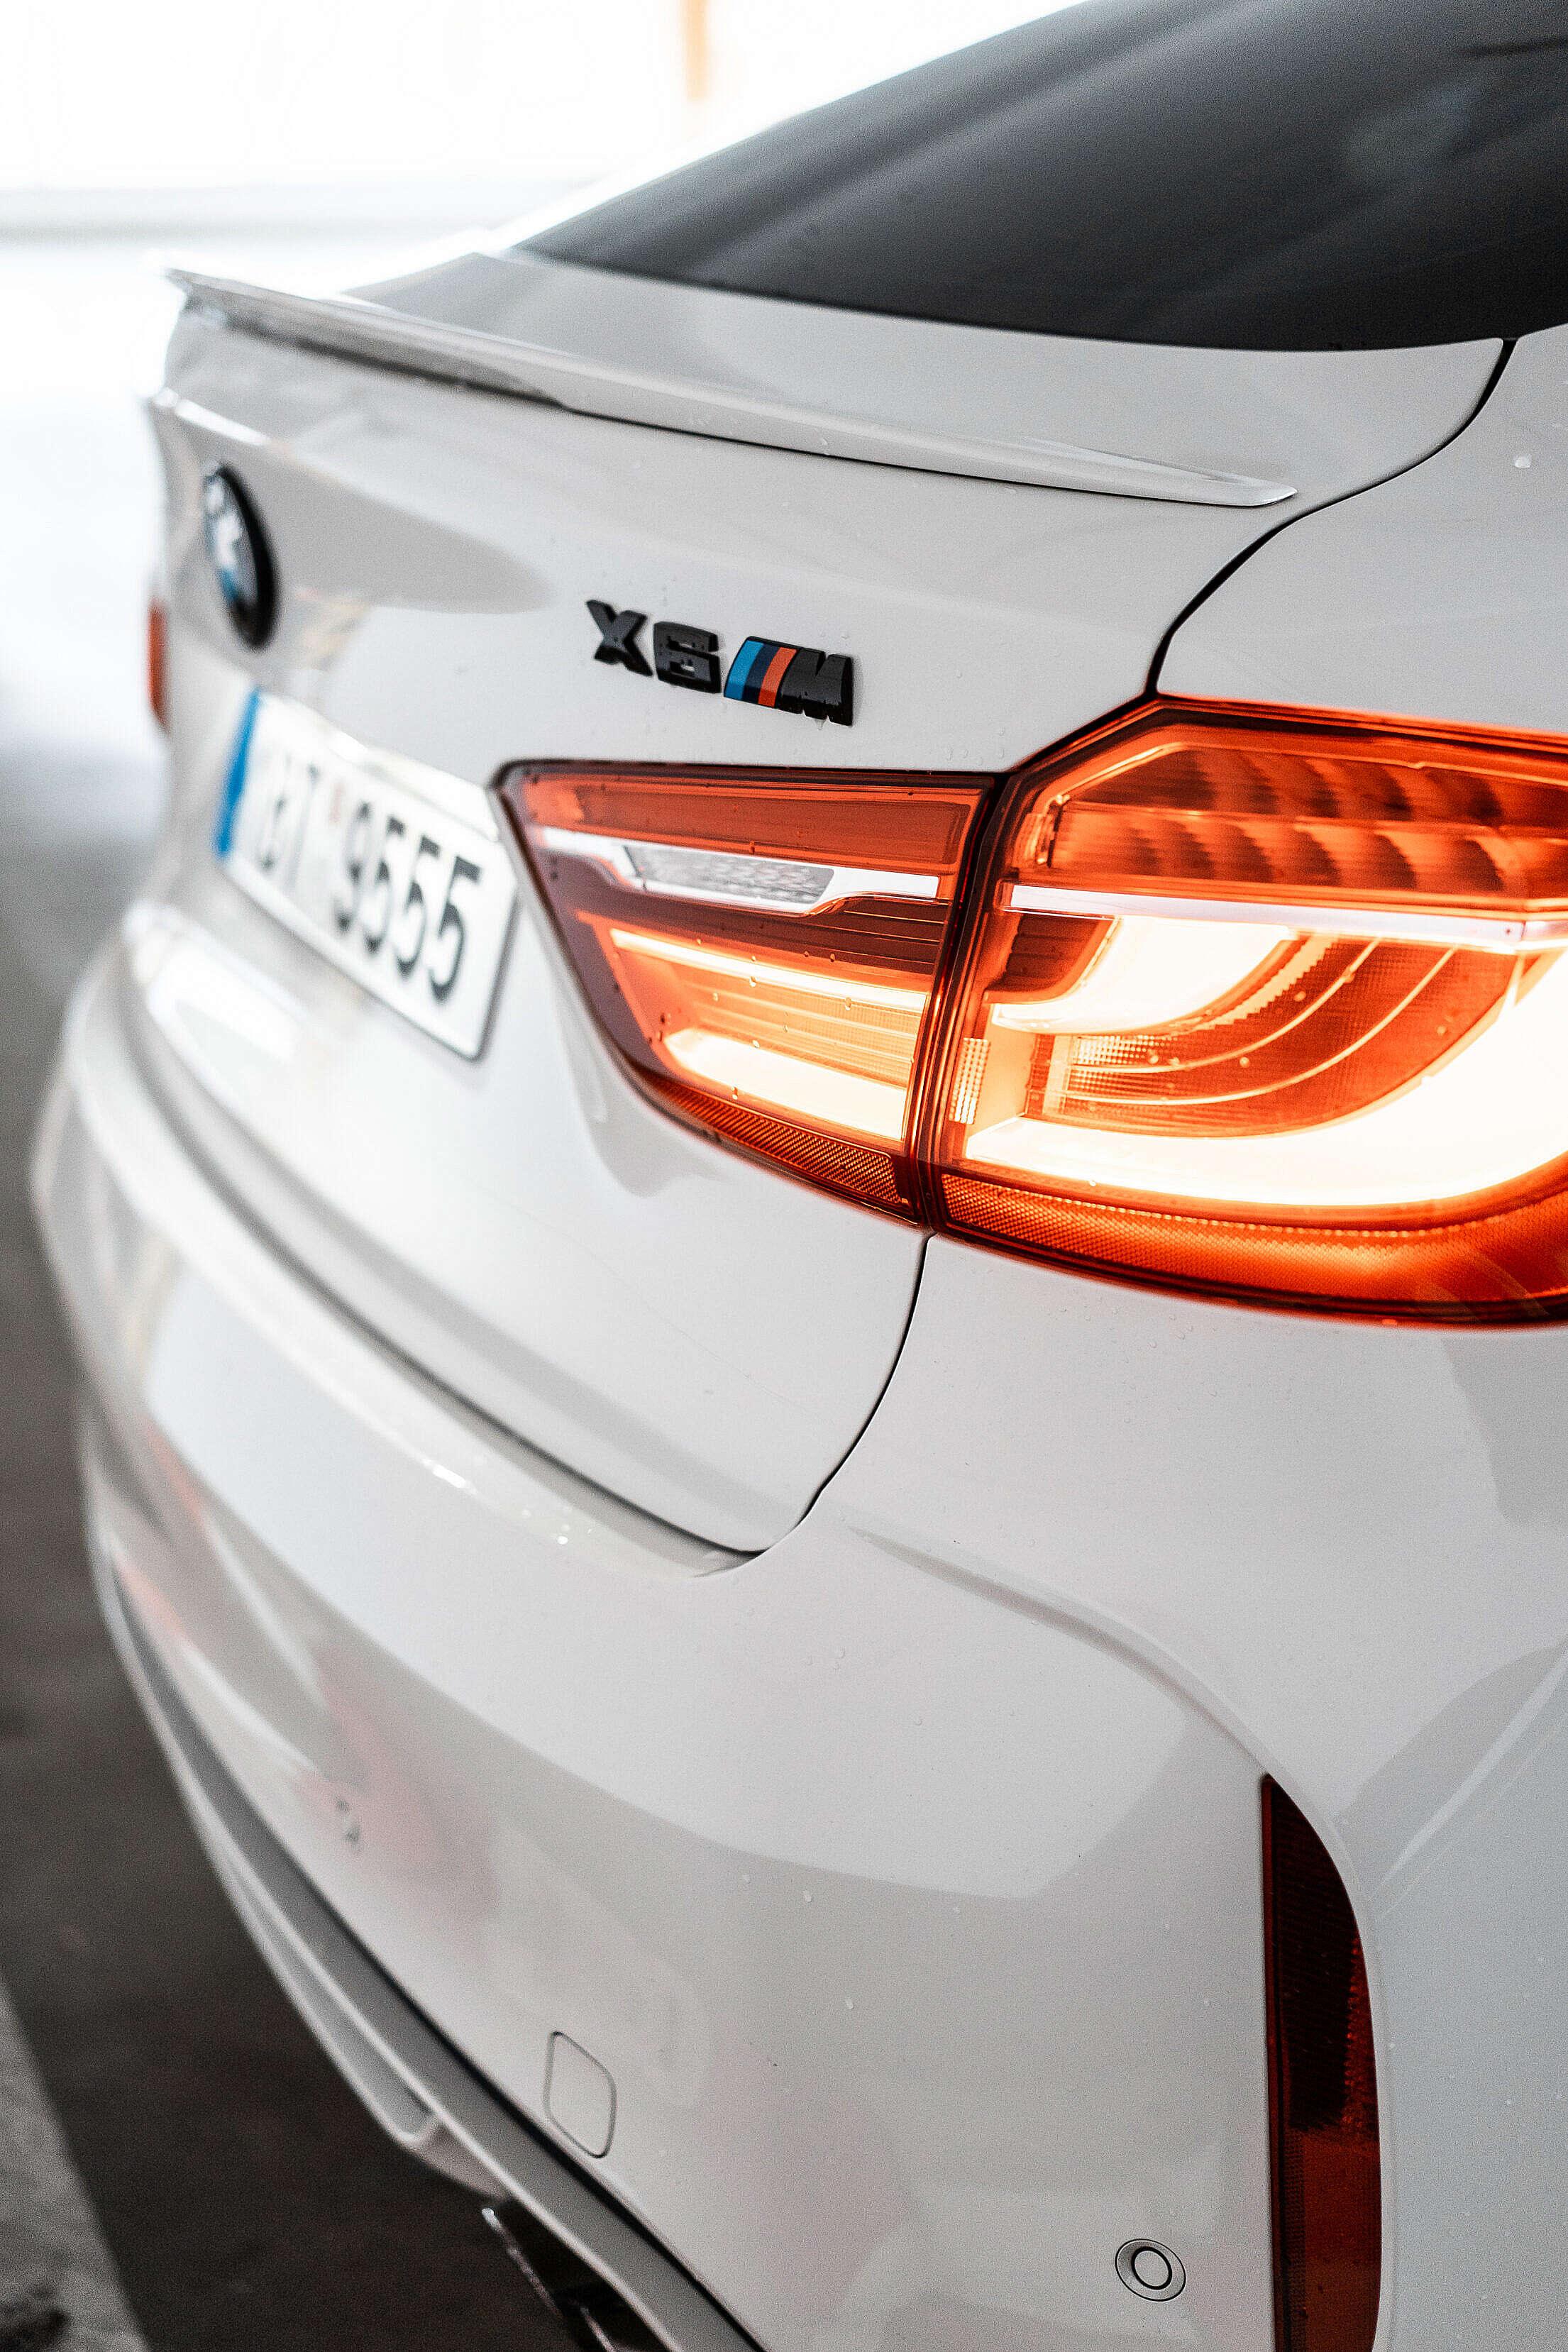 Tailgate and Black BMW X6M Emblem Free Stock Photo